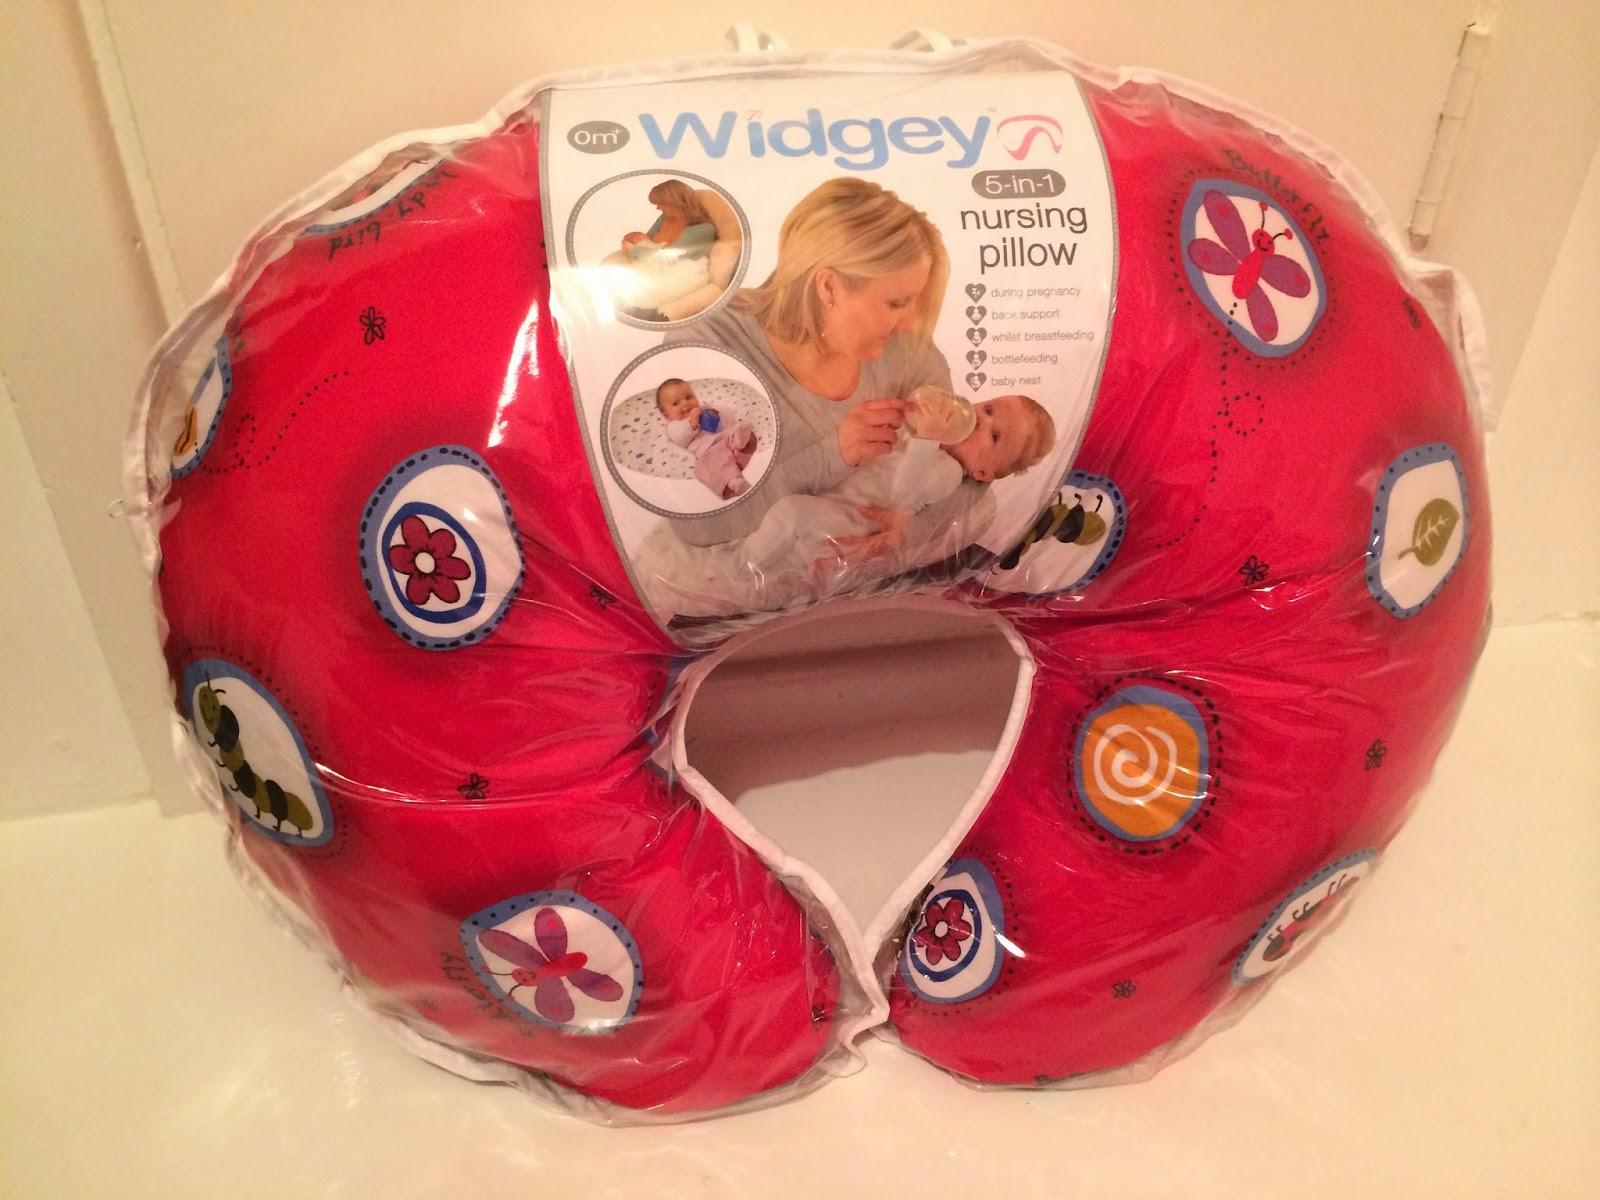 The Knott Bump Amp Us Tested Tuesday Widgey Nursing Pillow